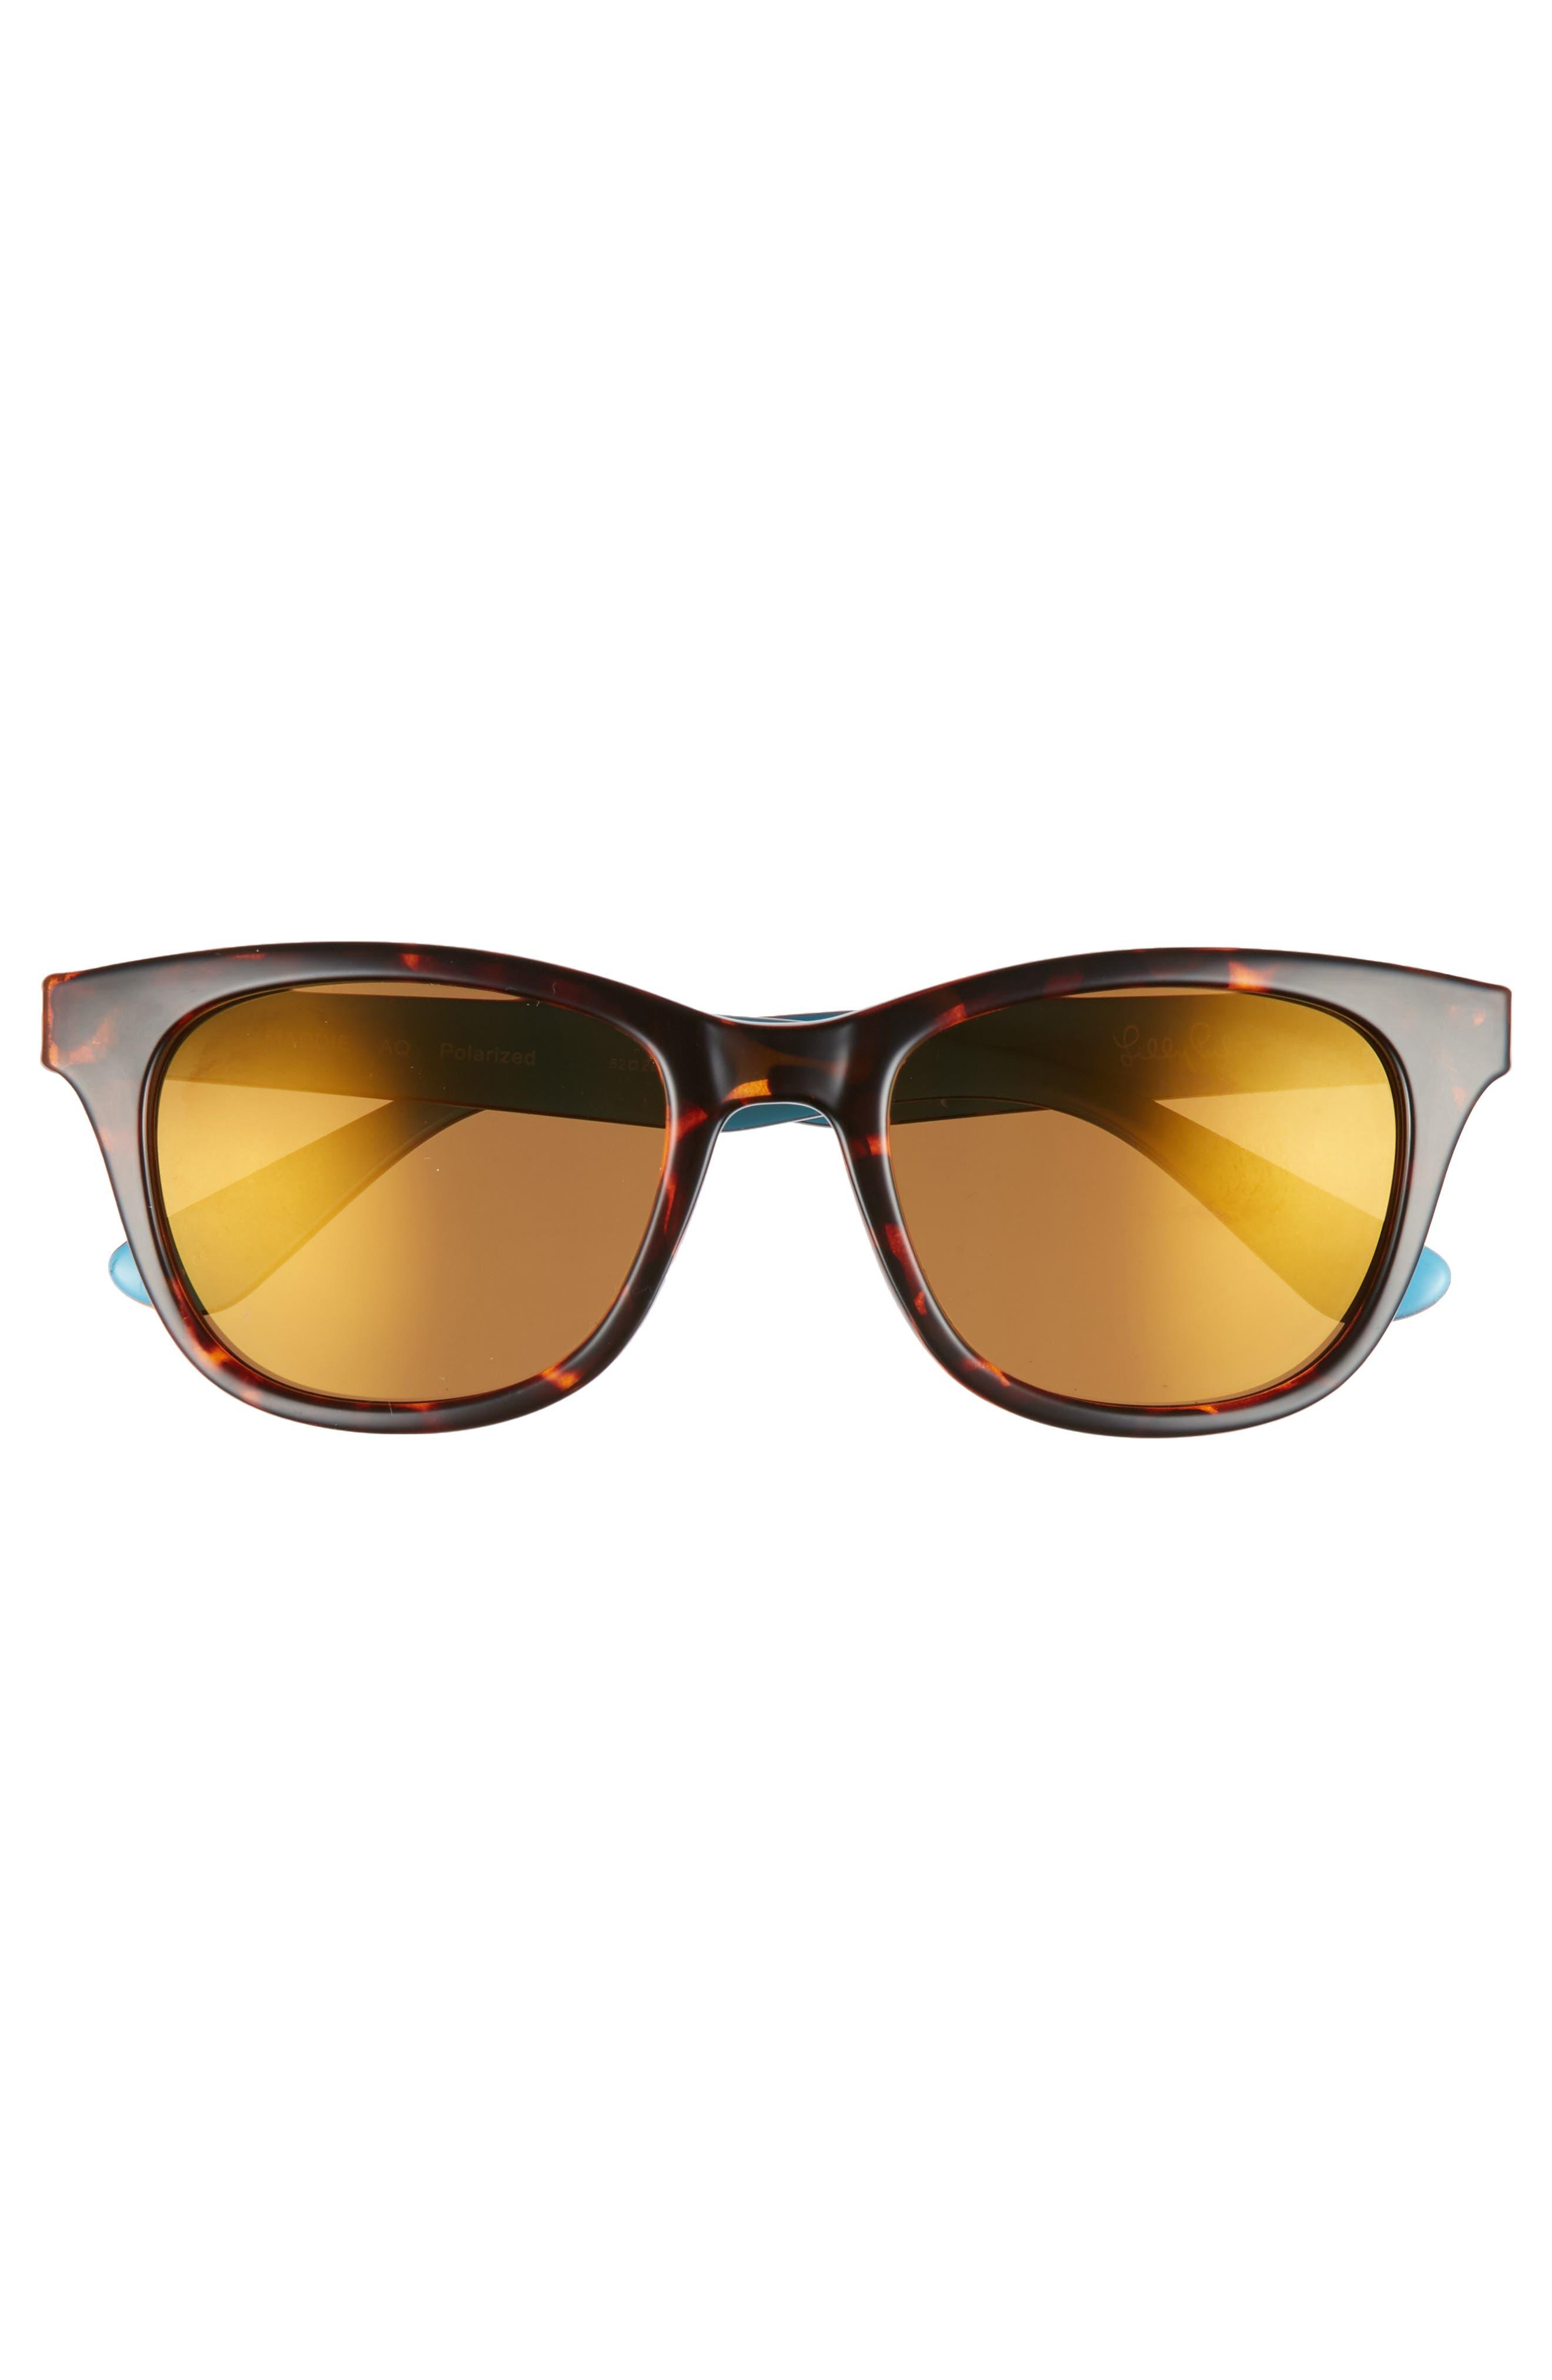 Maddie 52mm Polarized Mirrored Sunglasses,                             Alternate thumbnail 3, color,                             AQUA/ GOLD FLASH